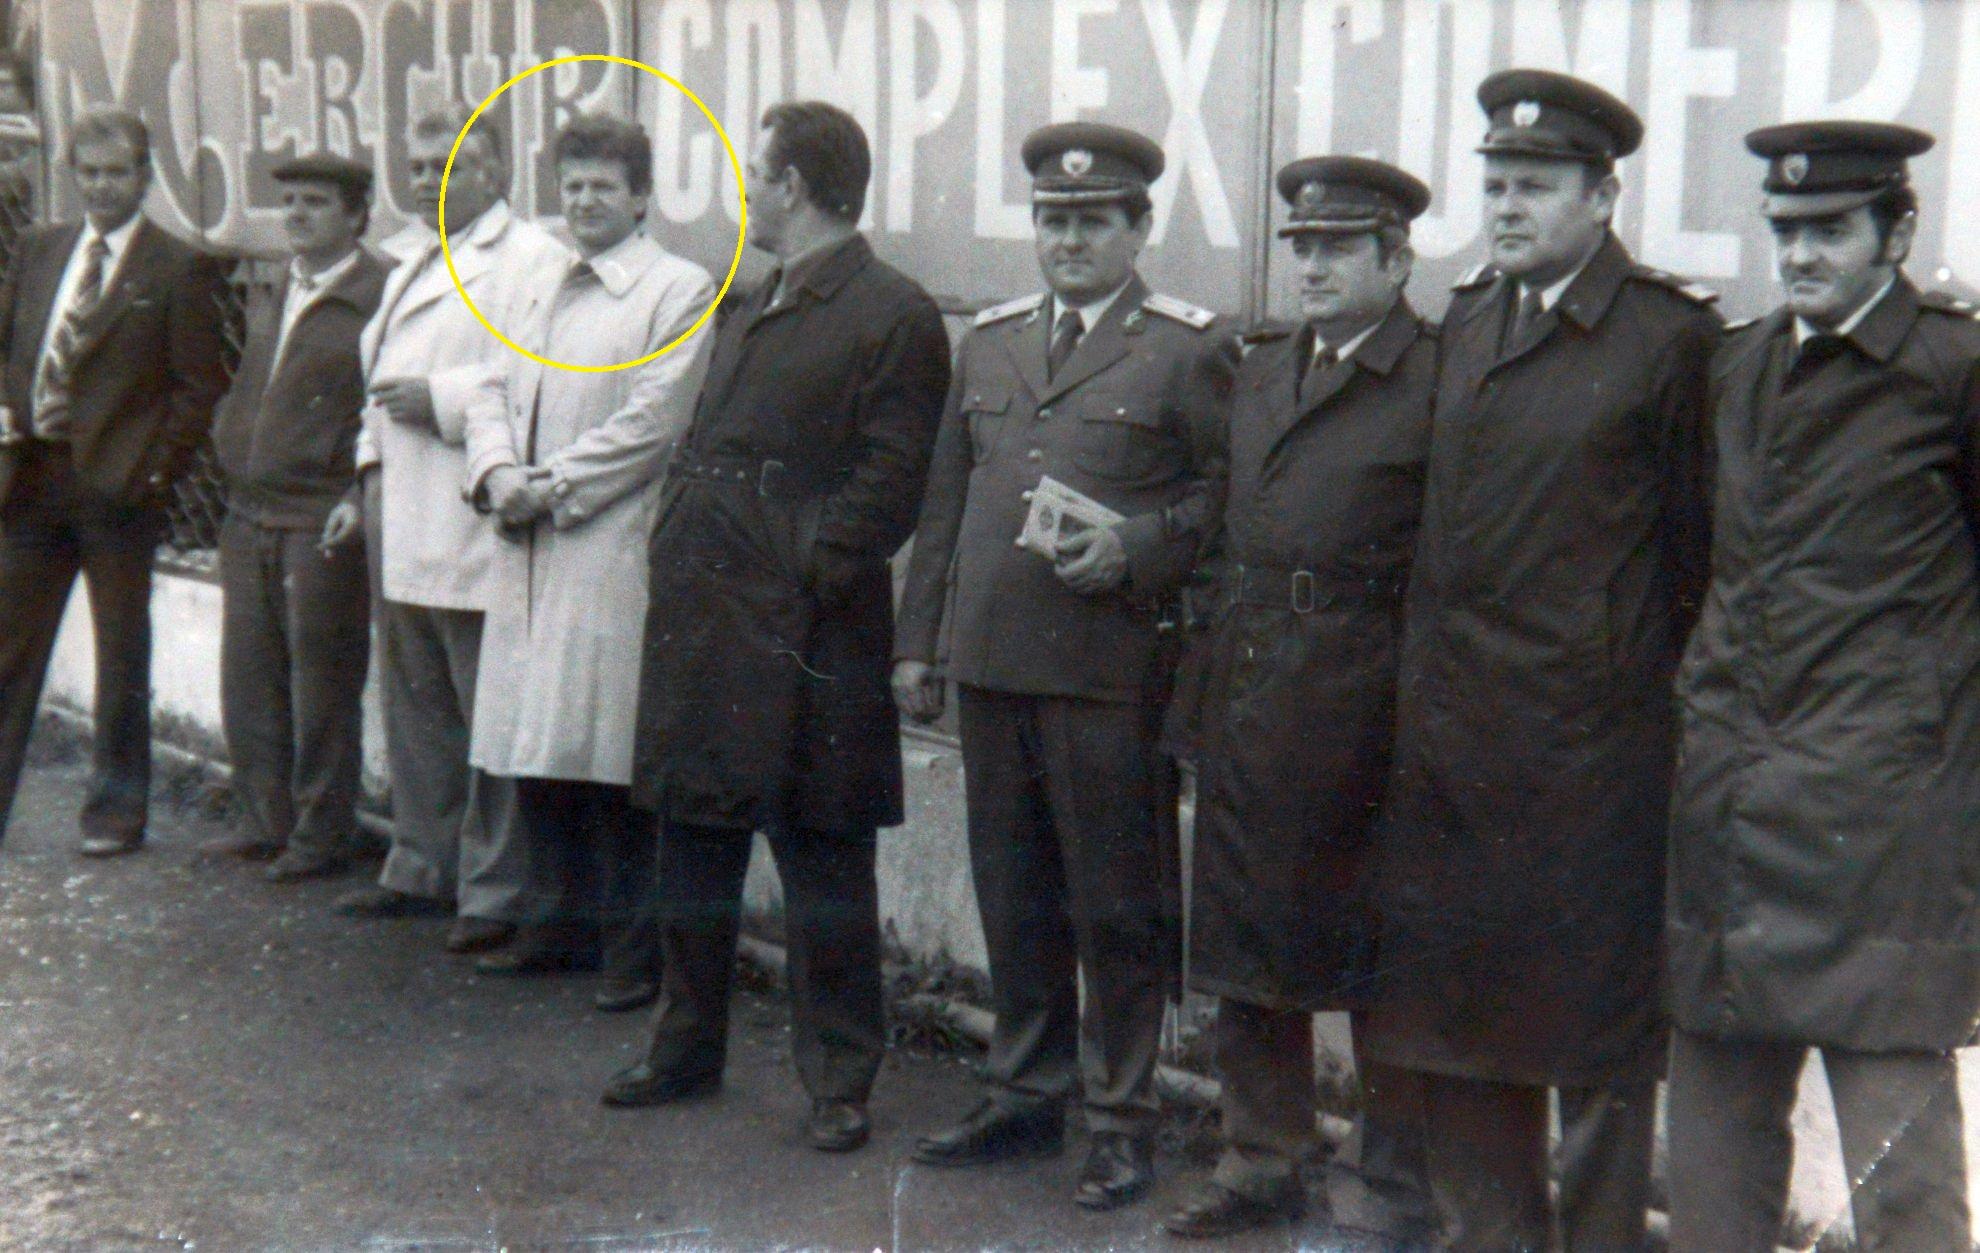 Pașcu (al patrulea de la stânga la dreapta) președinte la Brașov, imagine rară dinainte de Revoluţie